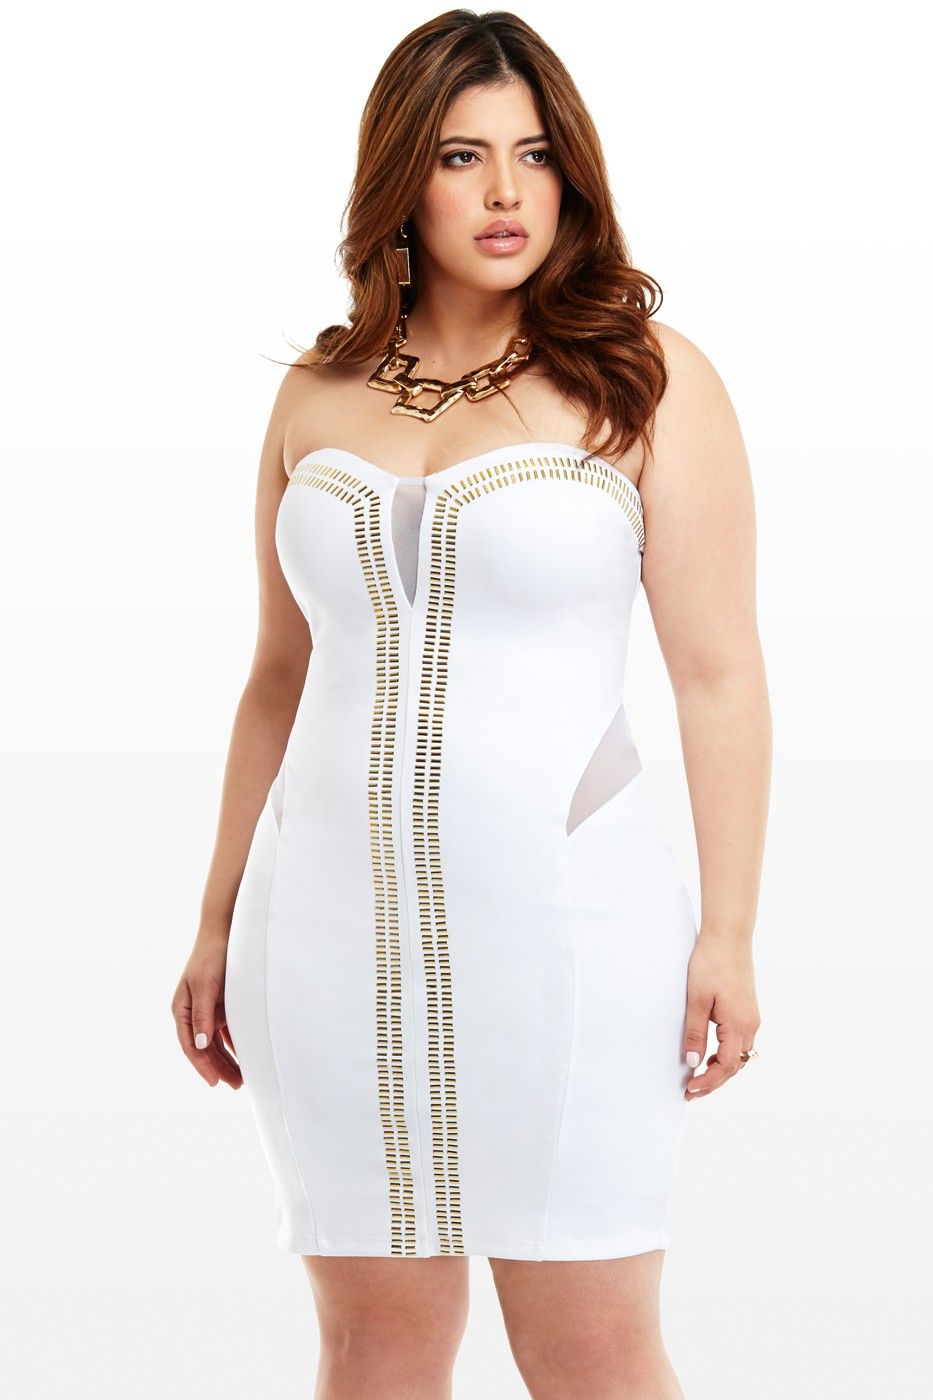 White hot rio gold trim dress my definition of womenus sexy